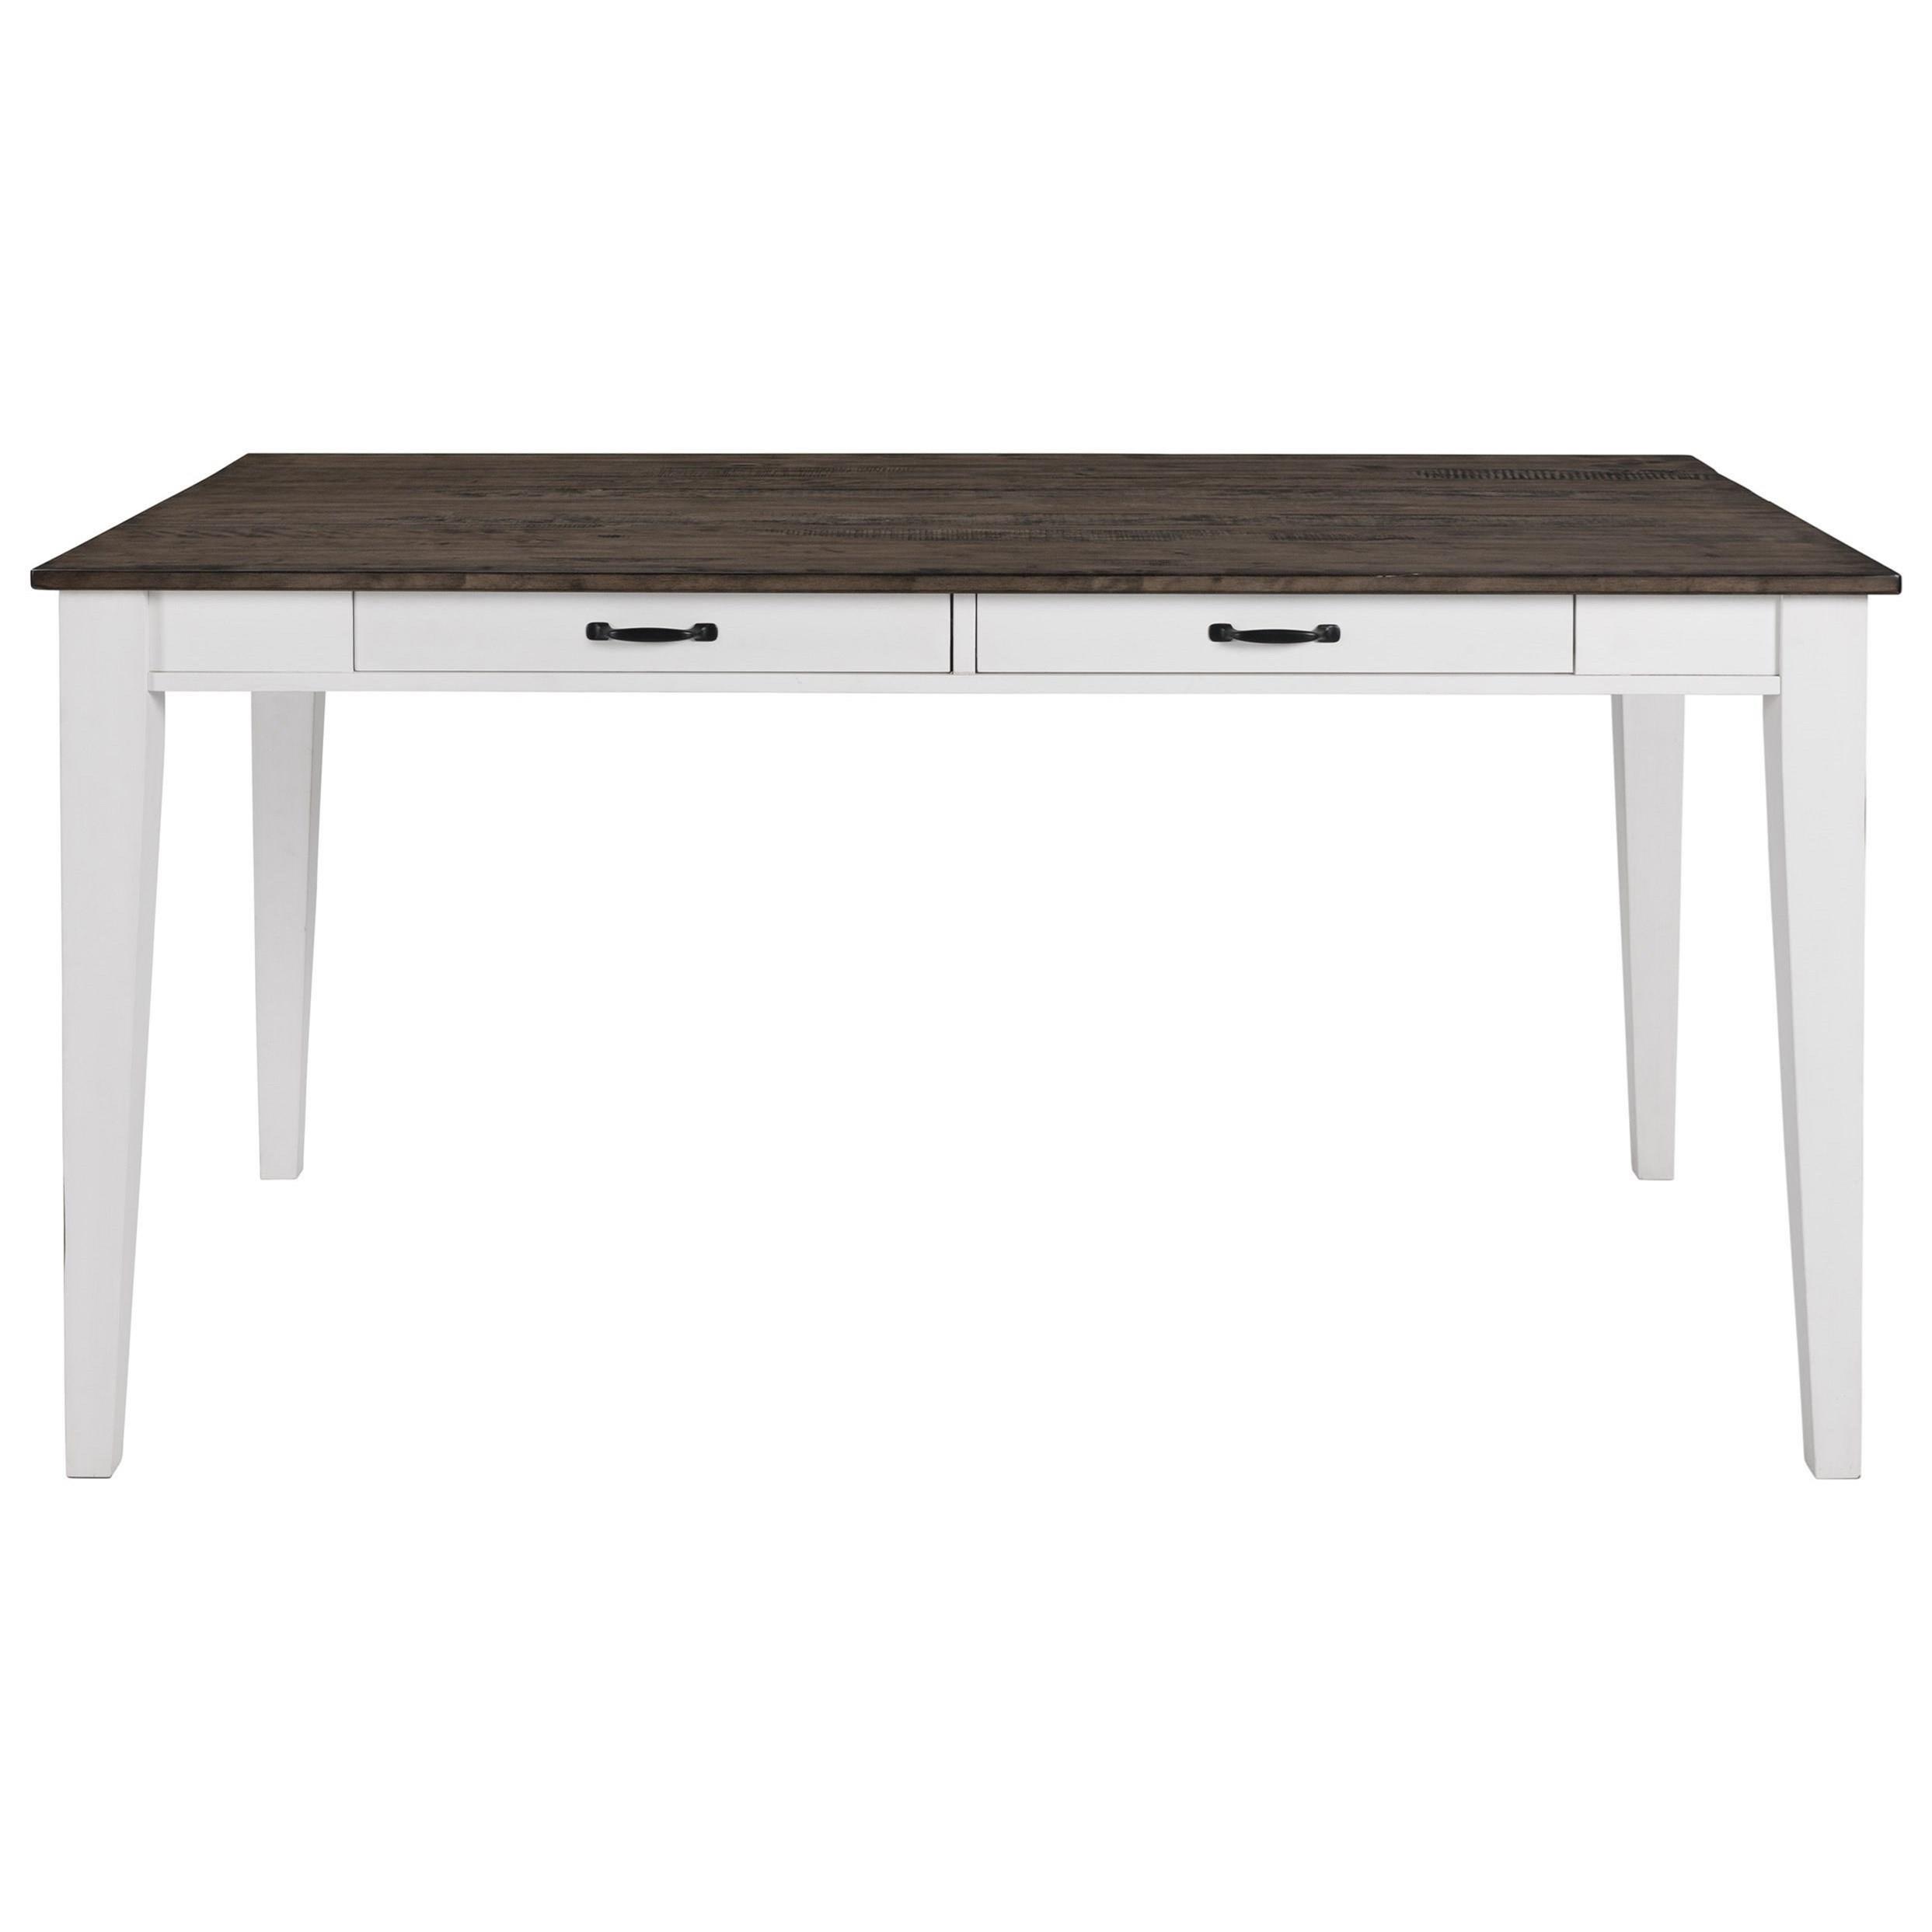 Belgium Farmhouse  Counter Table by VFM Signature at Virginia Furniture Market